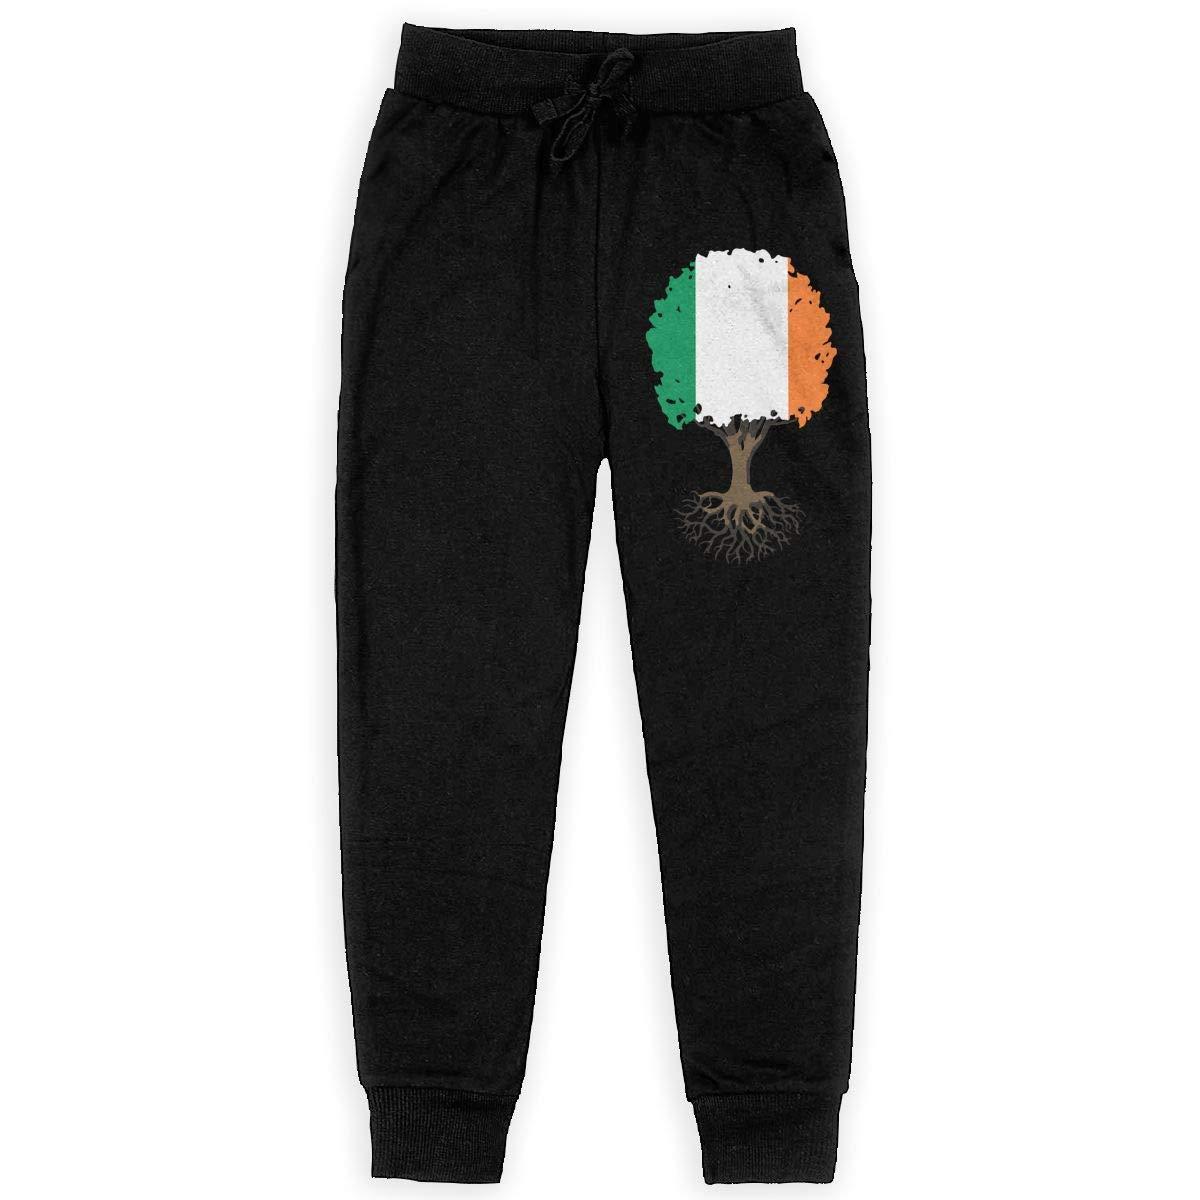 Boys Fleece Pants for Teenager Boys WYZVK22 Tree of Life with Irish Flag Soft//Cozy Sweatpants